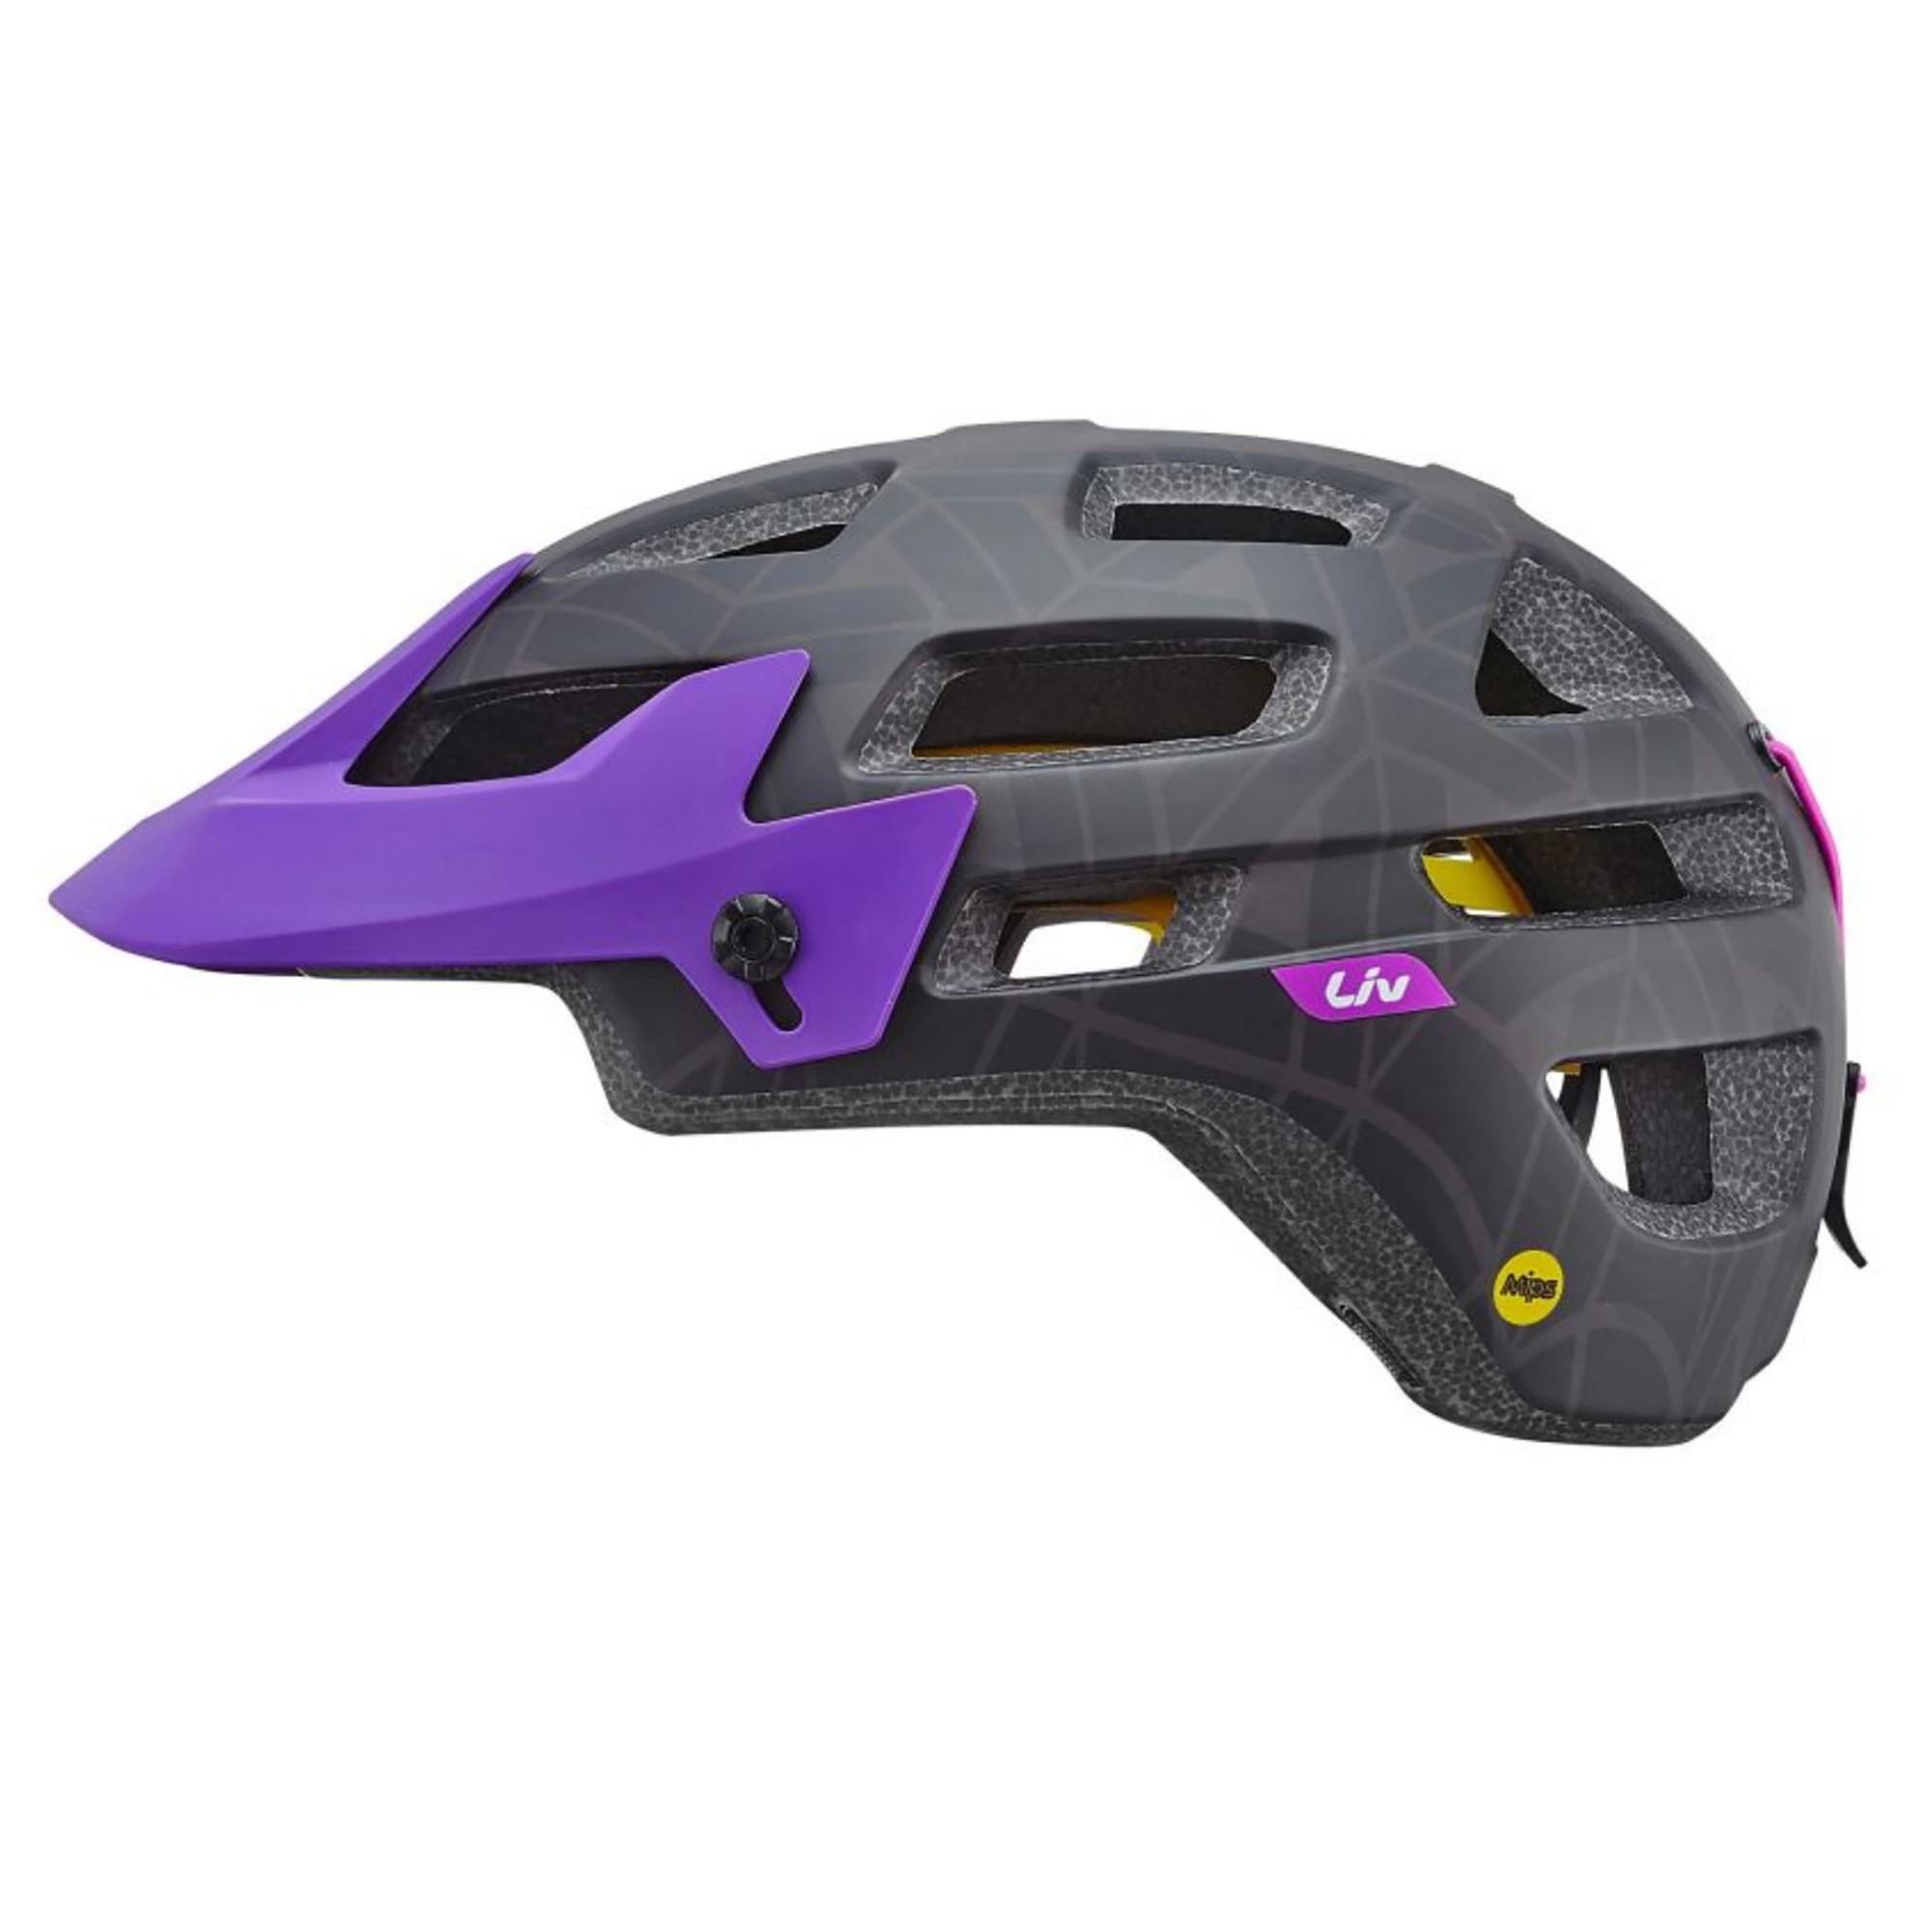 Casque Liv Infinita Mips Matte Black Purple